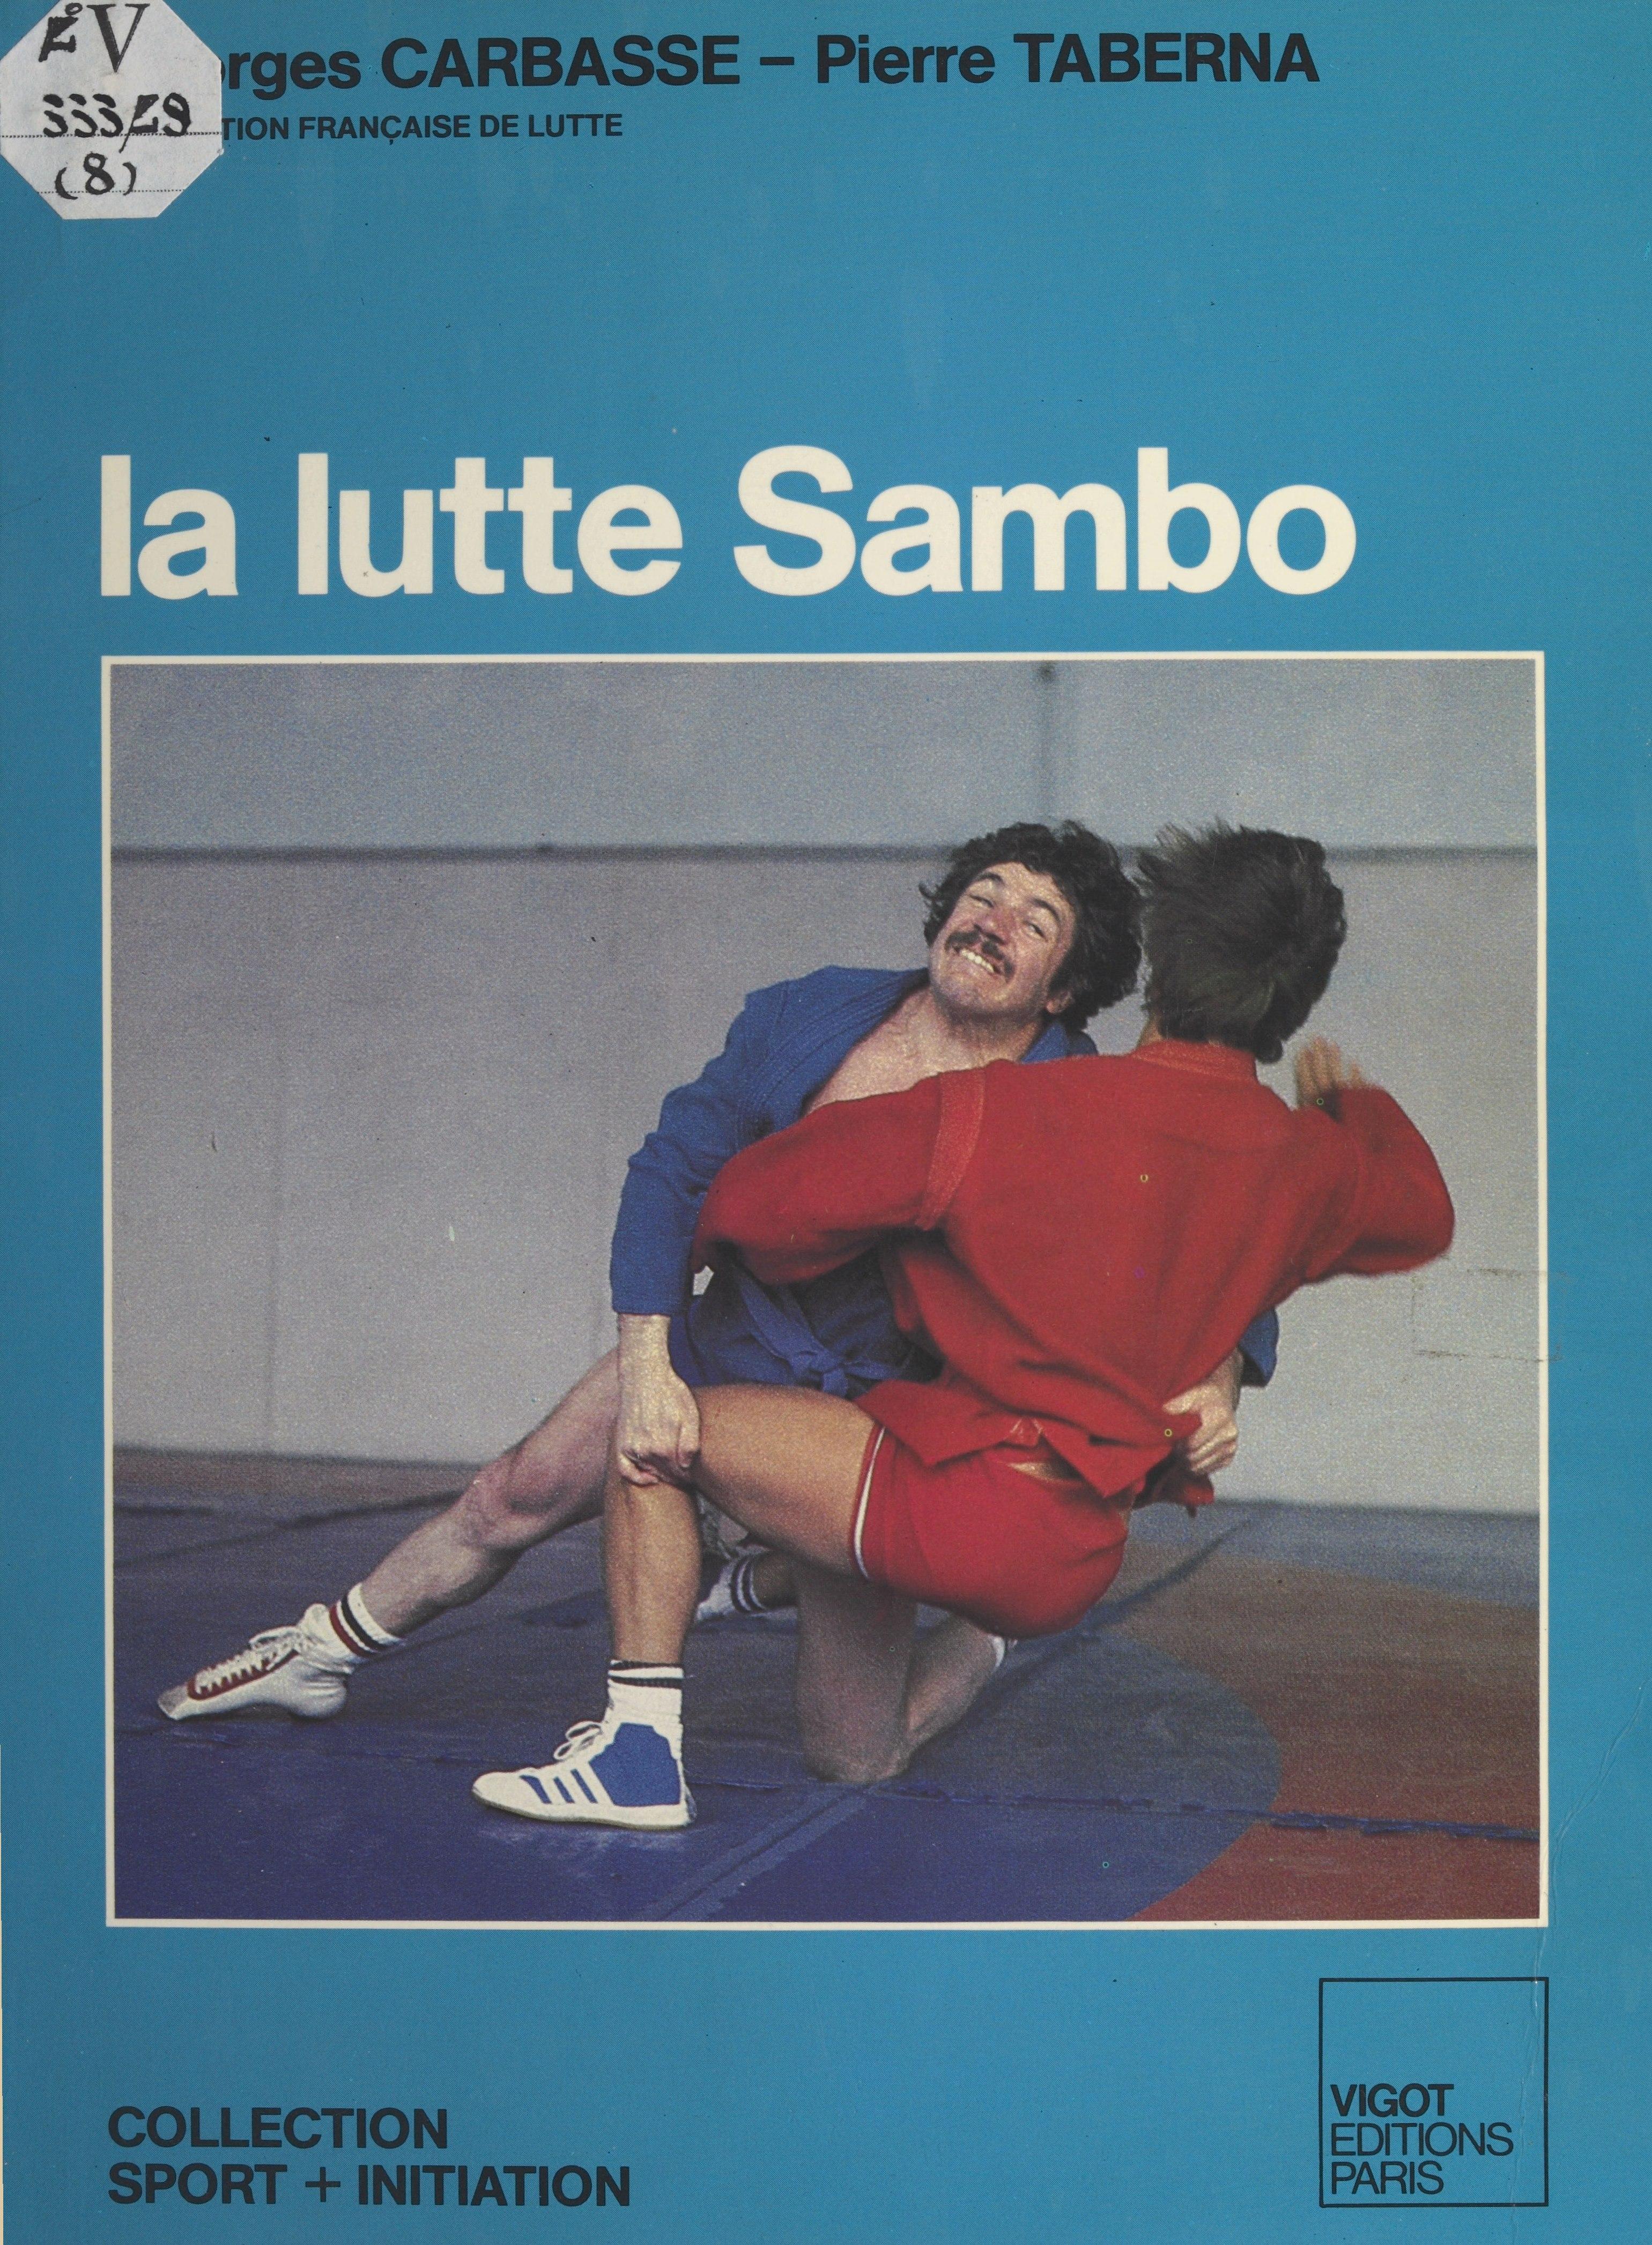 La Lutte Sambo